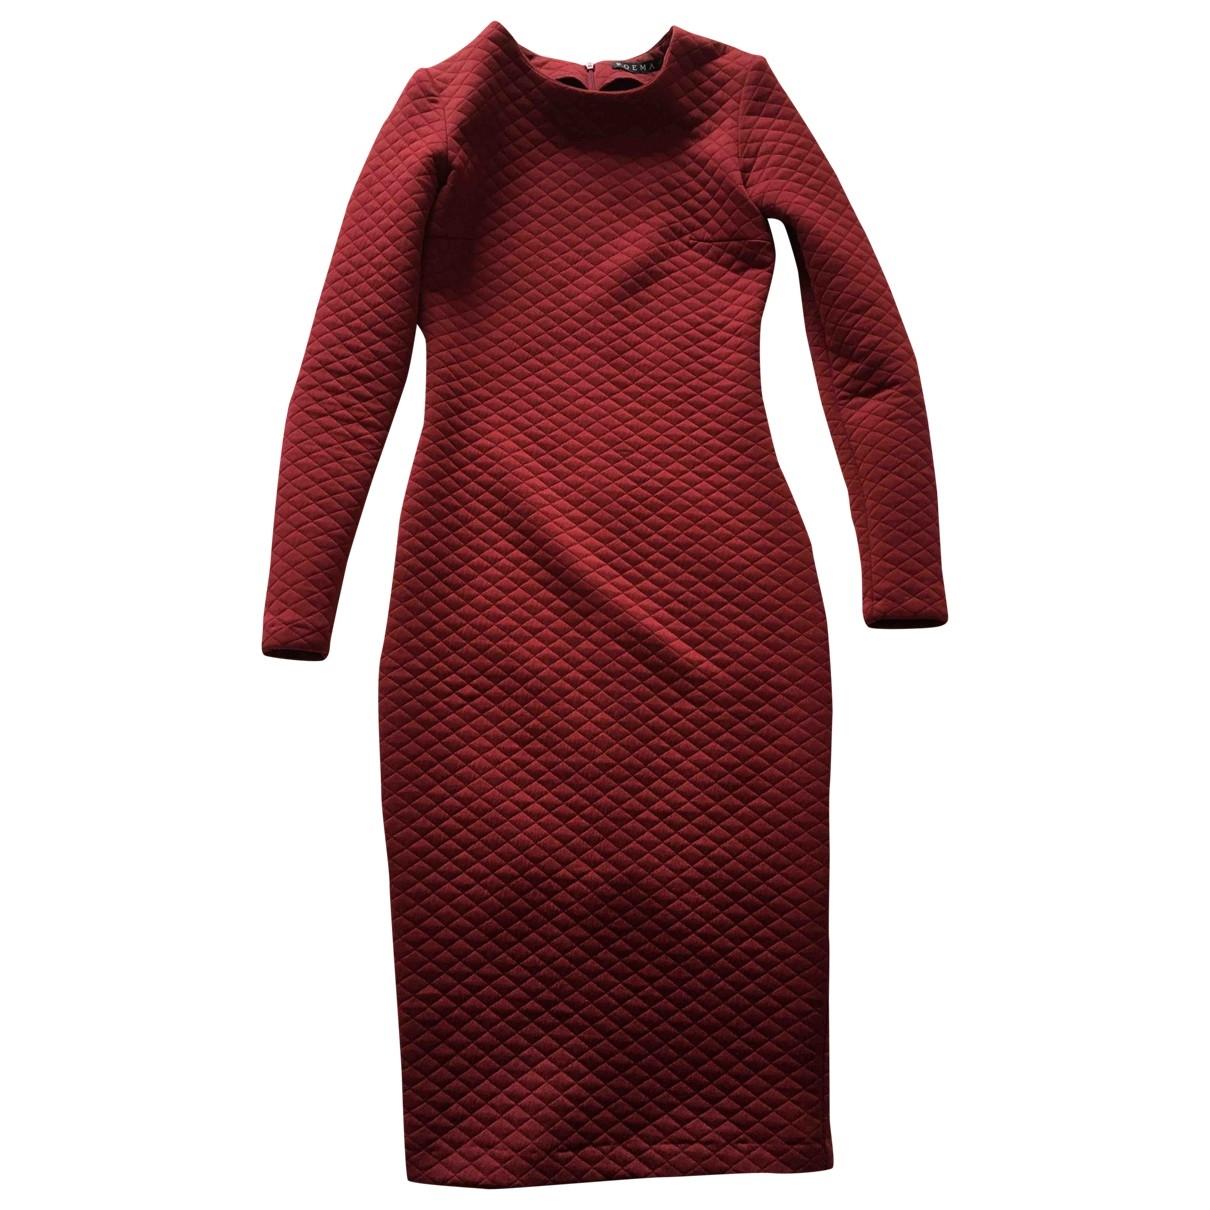 Non Signé / Unsigned \N Burgundy dress for Women 36 FR